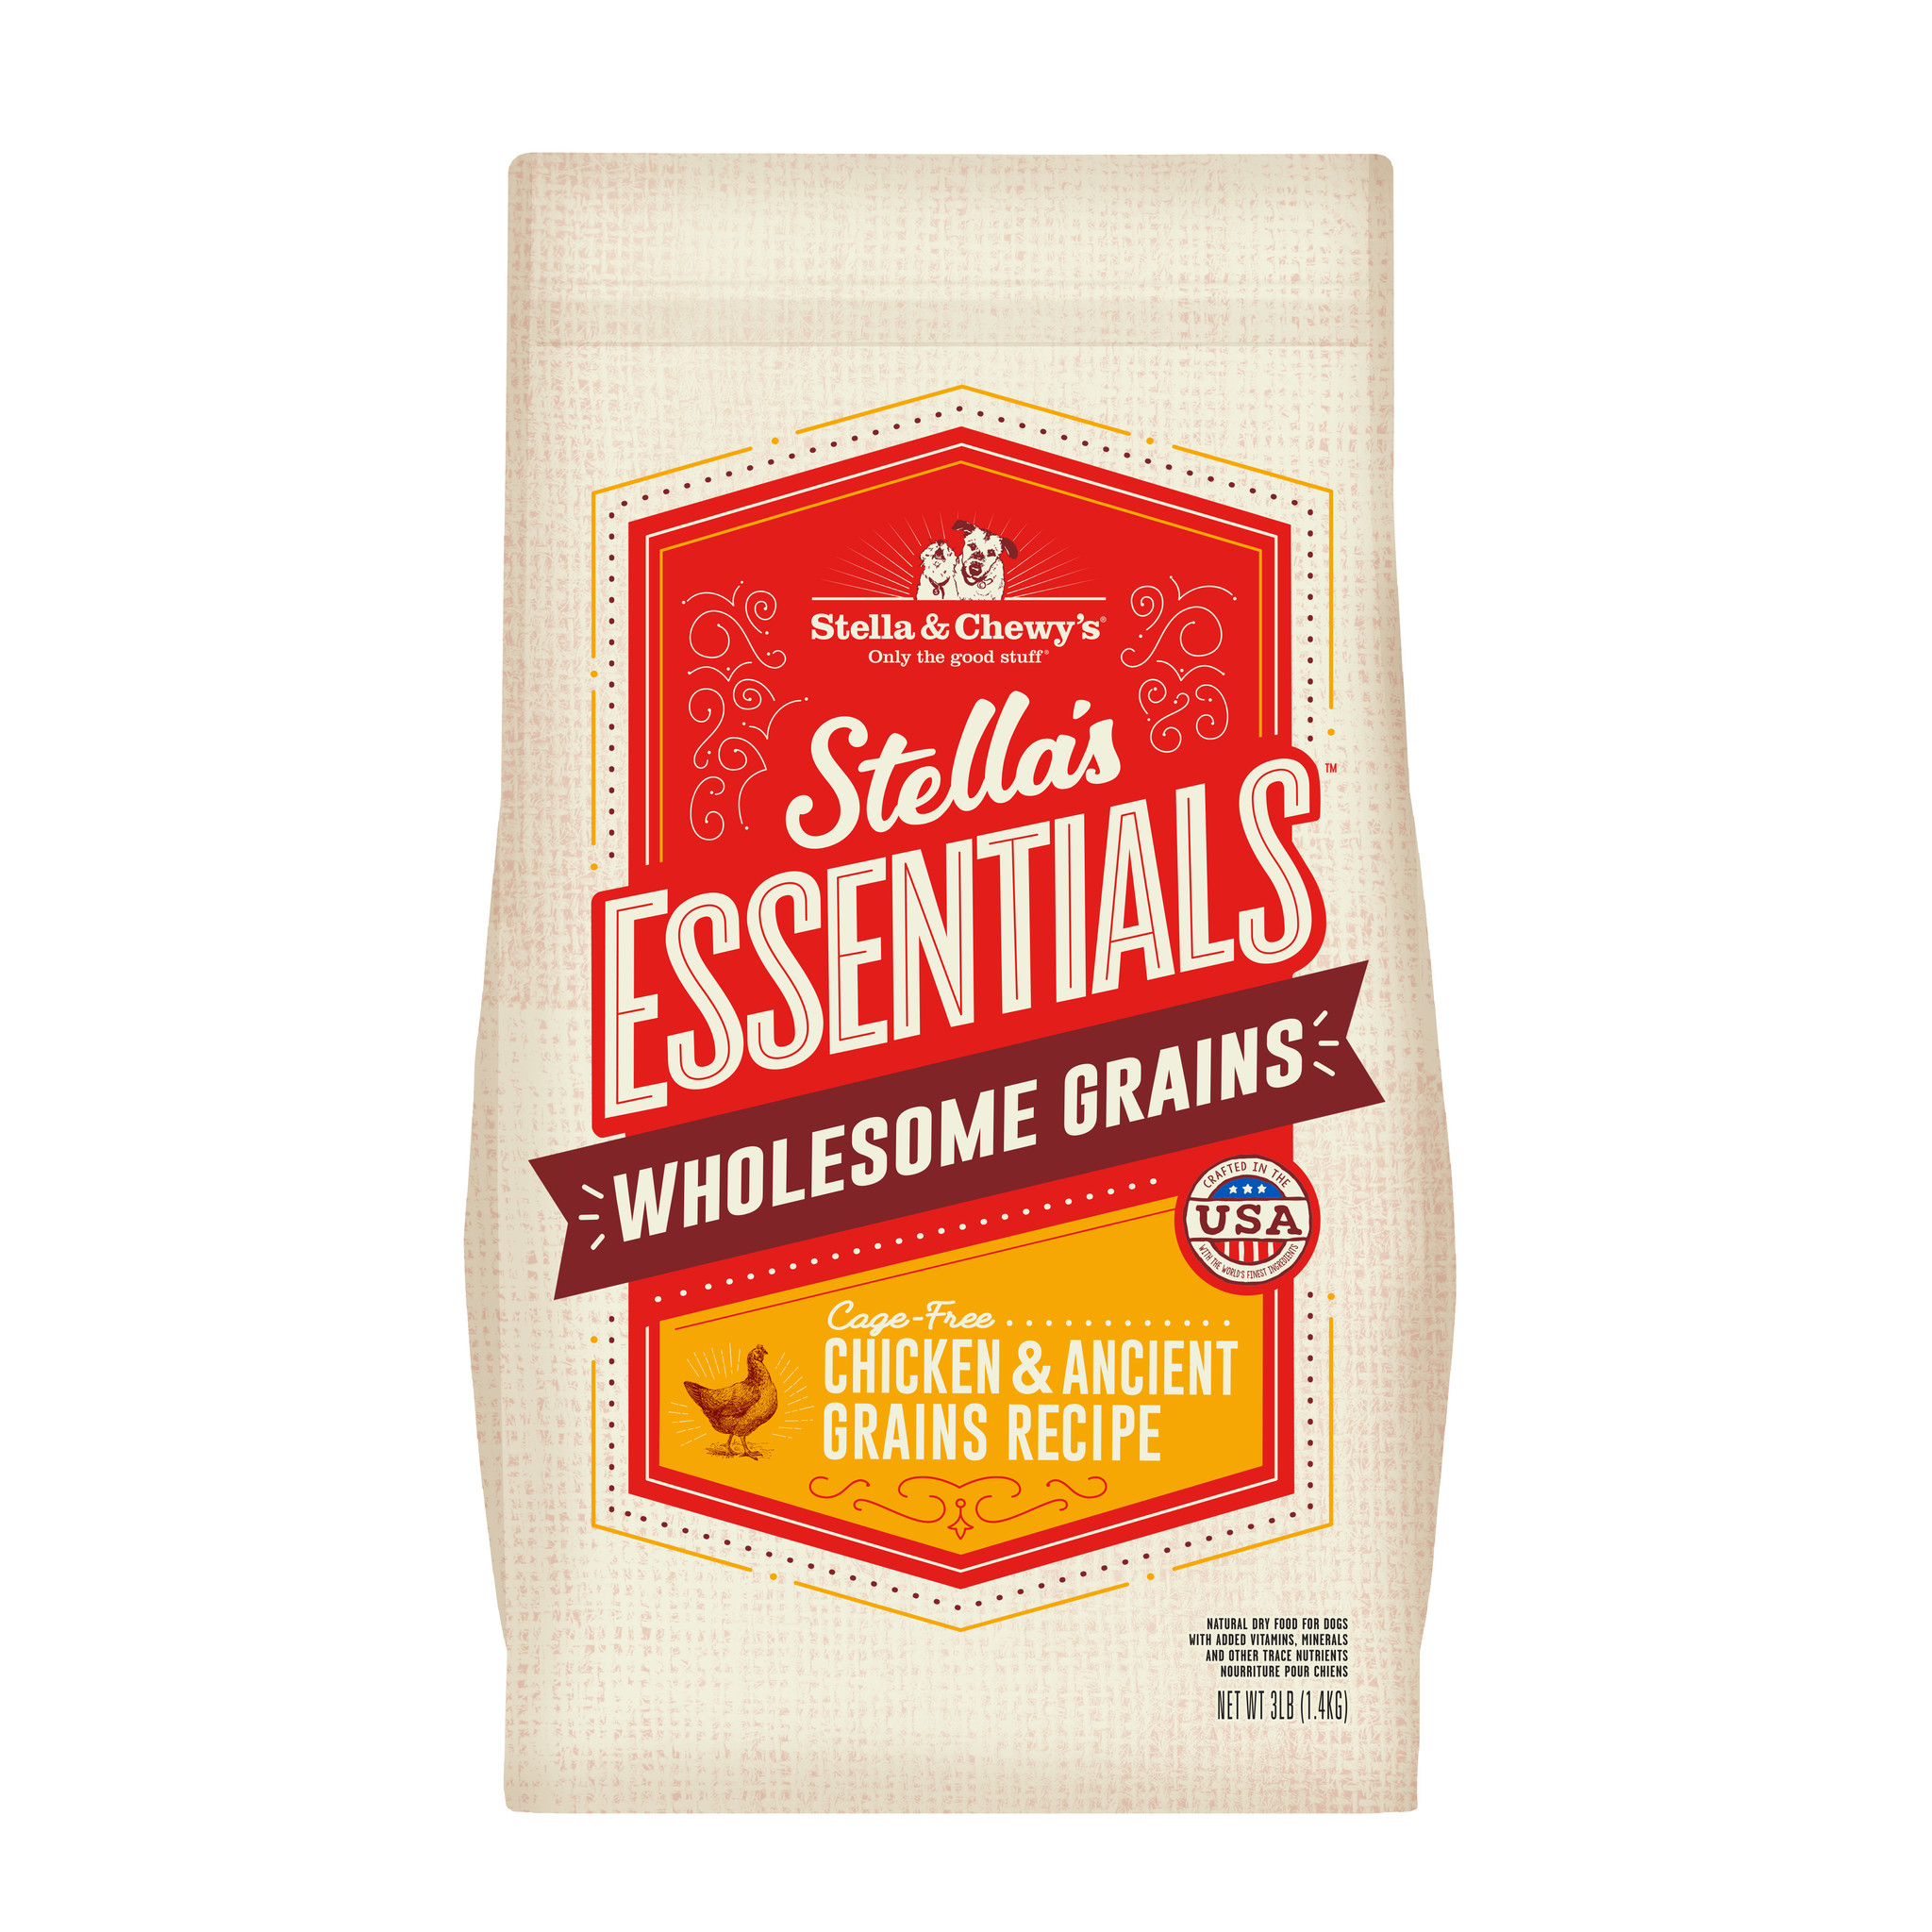 Stella & Chewys Stella & Chewys Stella's Essentials Cage-Free Chicken & Ancient Grains Recipe